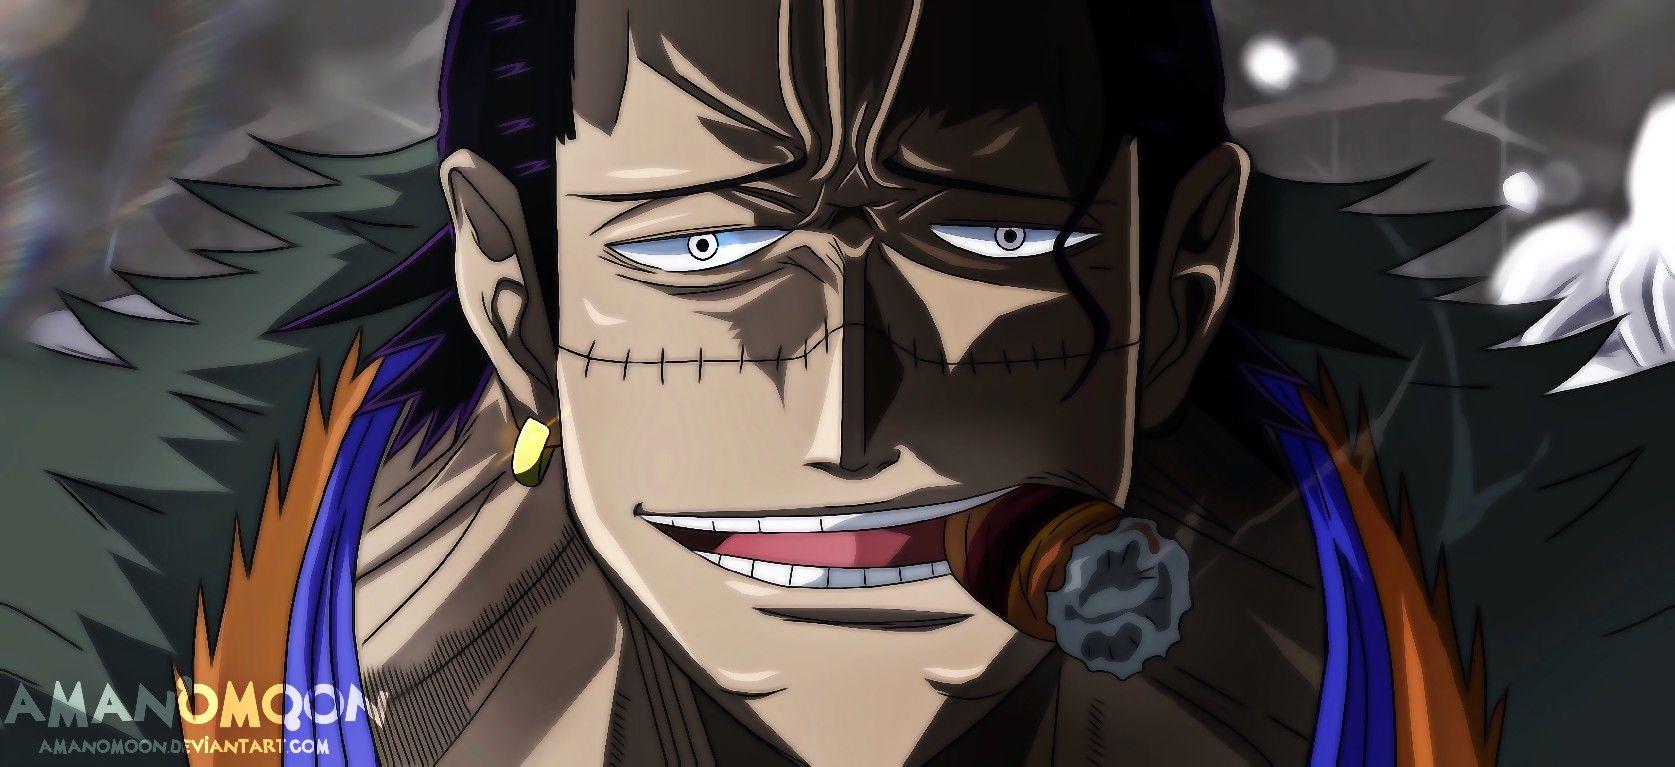 One Piece Crocodile | Sir crocodile, One piece wallpaper iphone, One piece manga